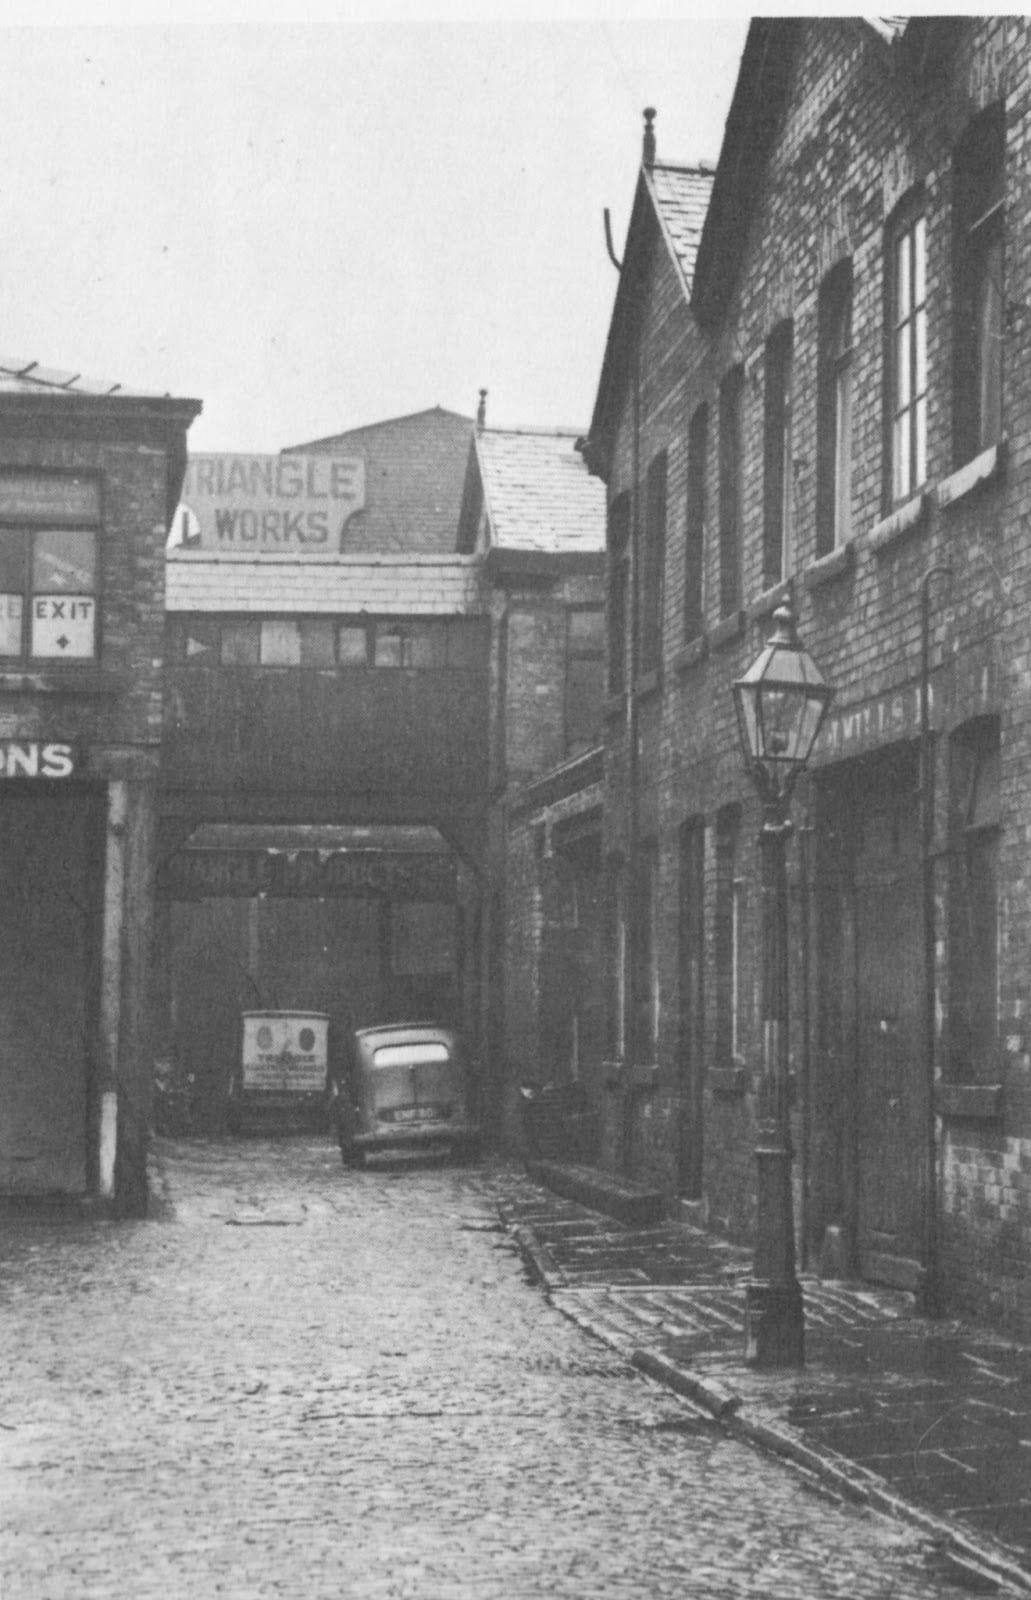 Otra vista de la calle Cooke en Manchester